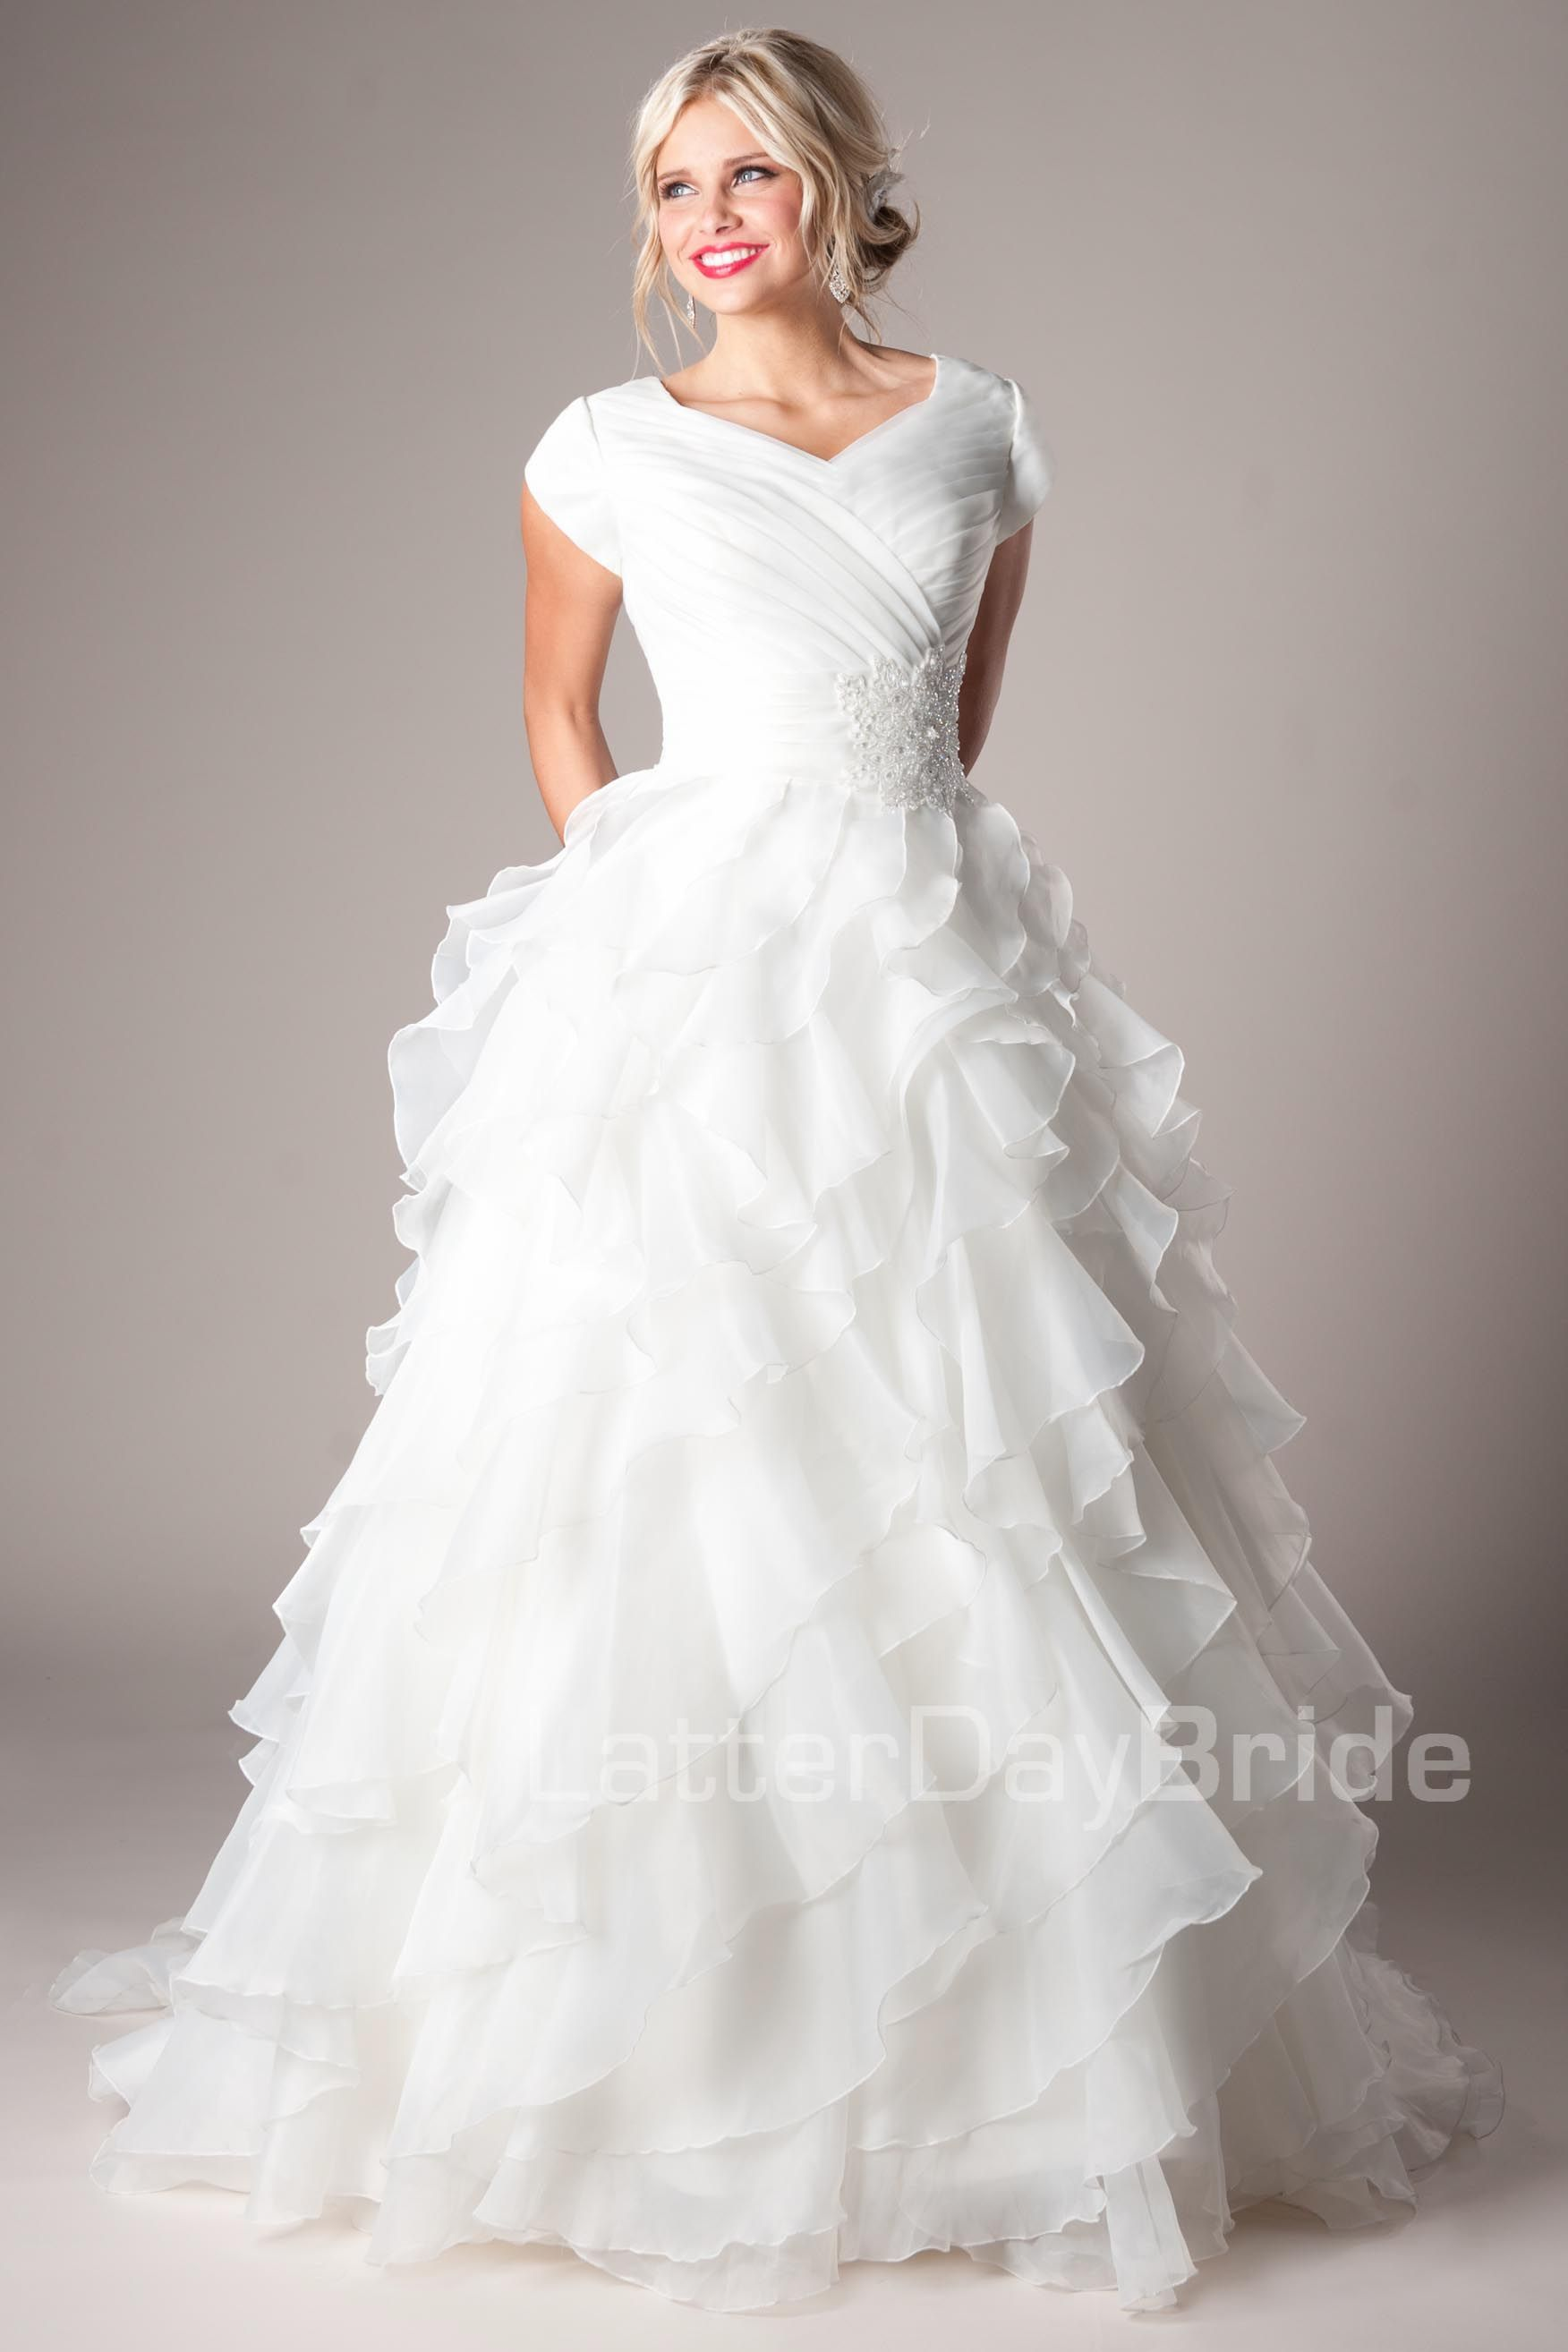 Casanova modest wedding dress latter day bride prom for Modest ball gown wedding dresses